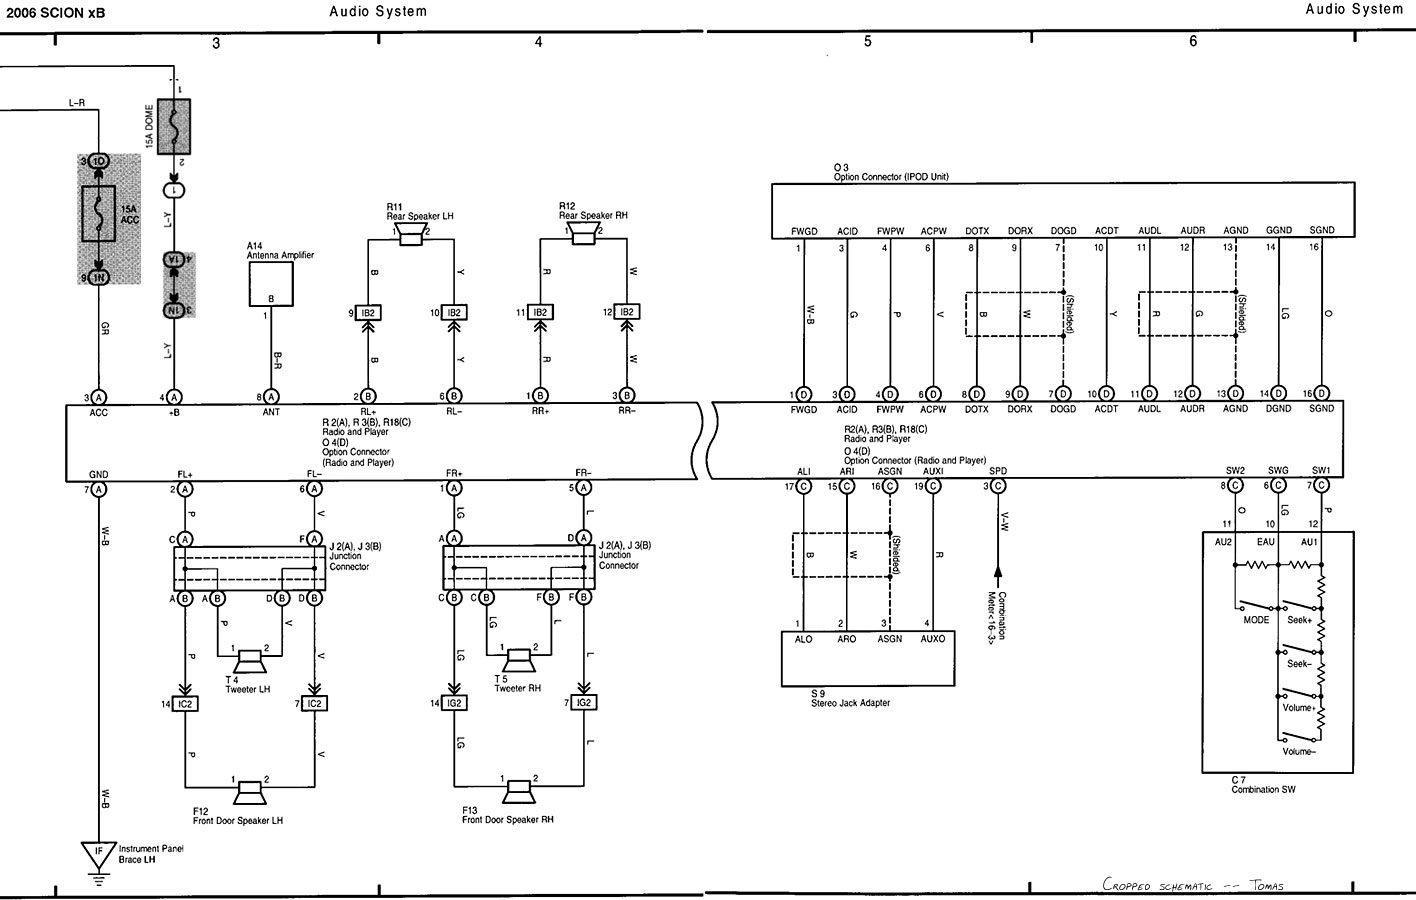 2007 Box Scion Fuse Wiring Library. 2007 Box Scion Fuse. Scion. Scion Xa Instrument Cluster Diagram At Scoala.co